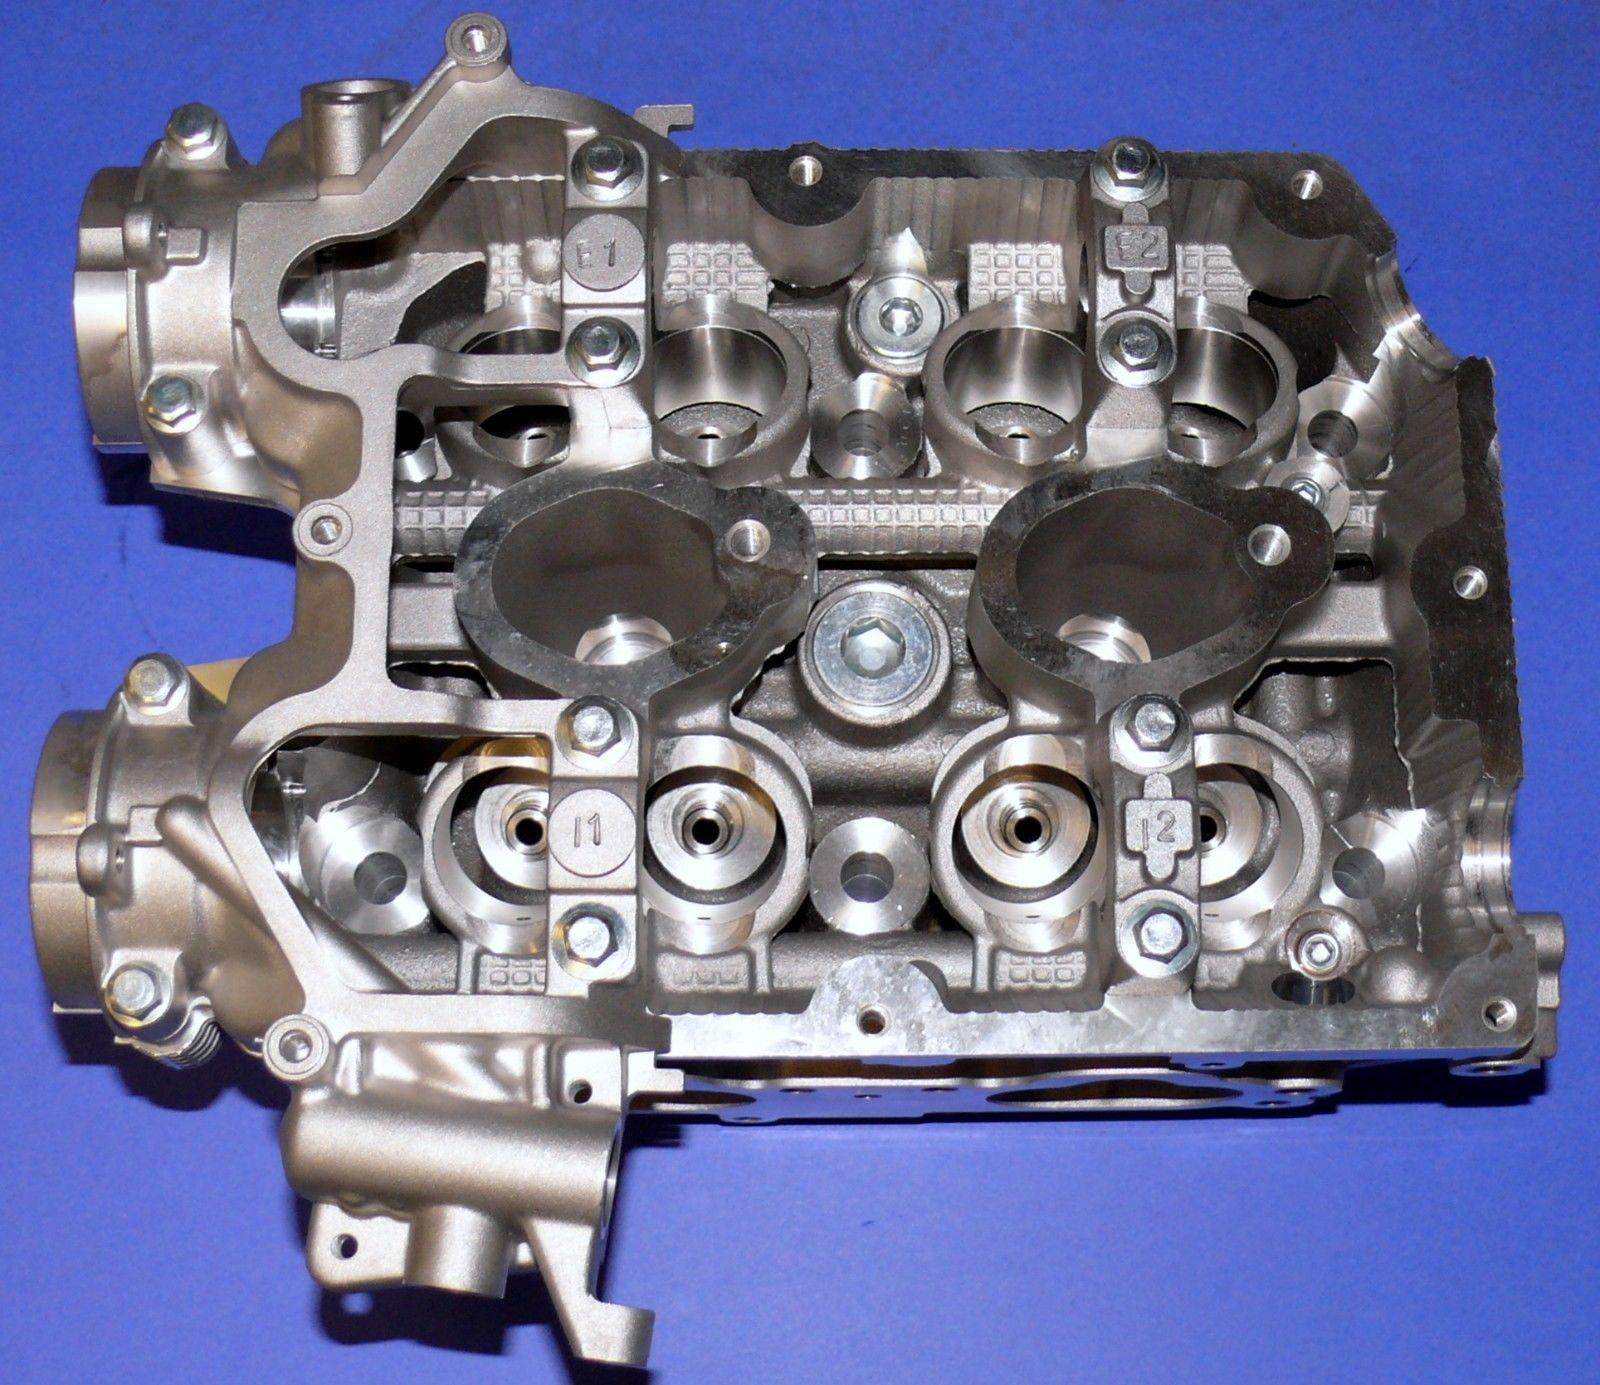 NEW Subaru WRX STi 2 5 DOHC CYLINDER HEAD #B25 BARE CAST RIGHT SIDE TURBO  06-13